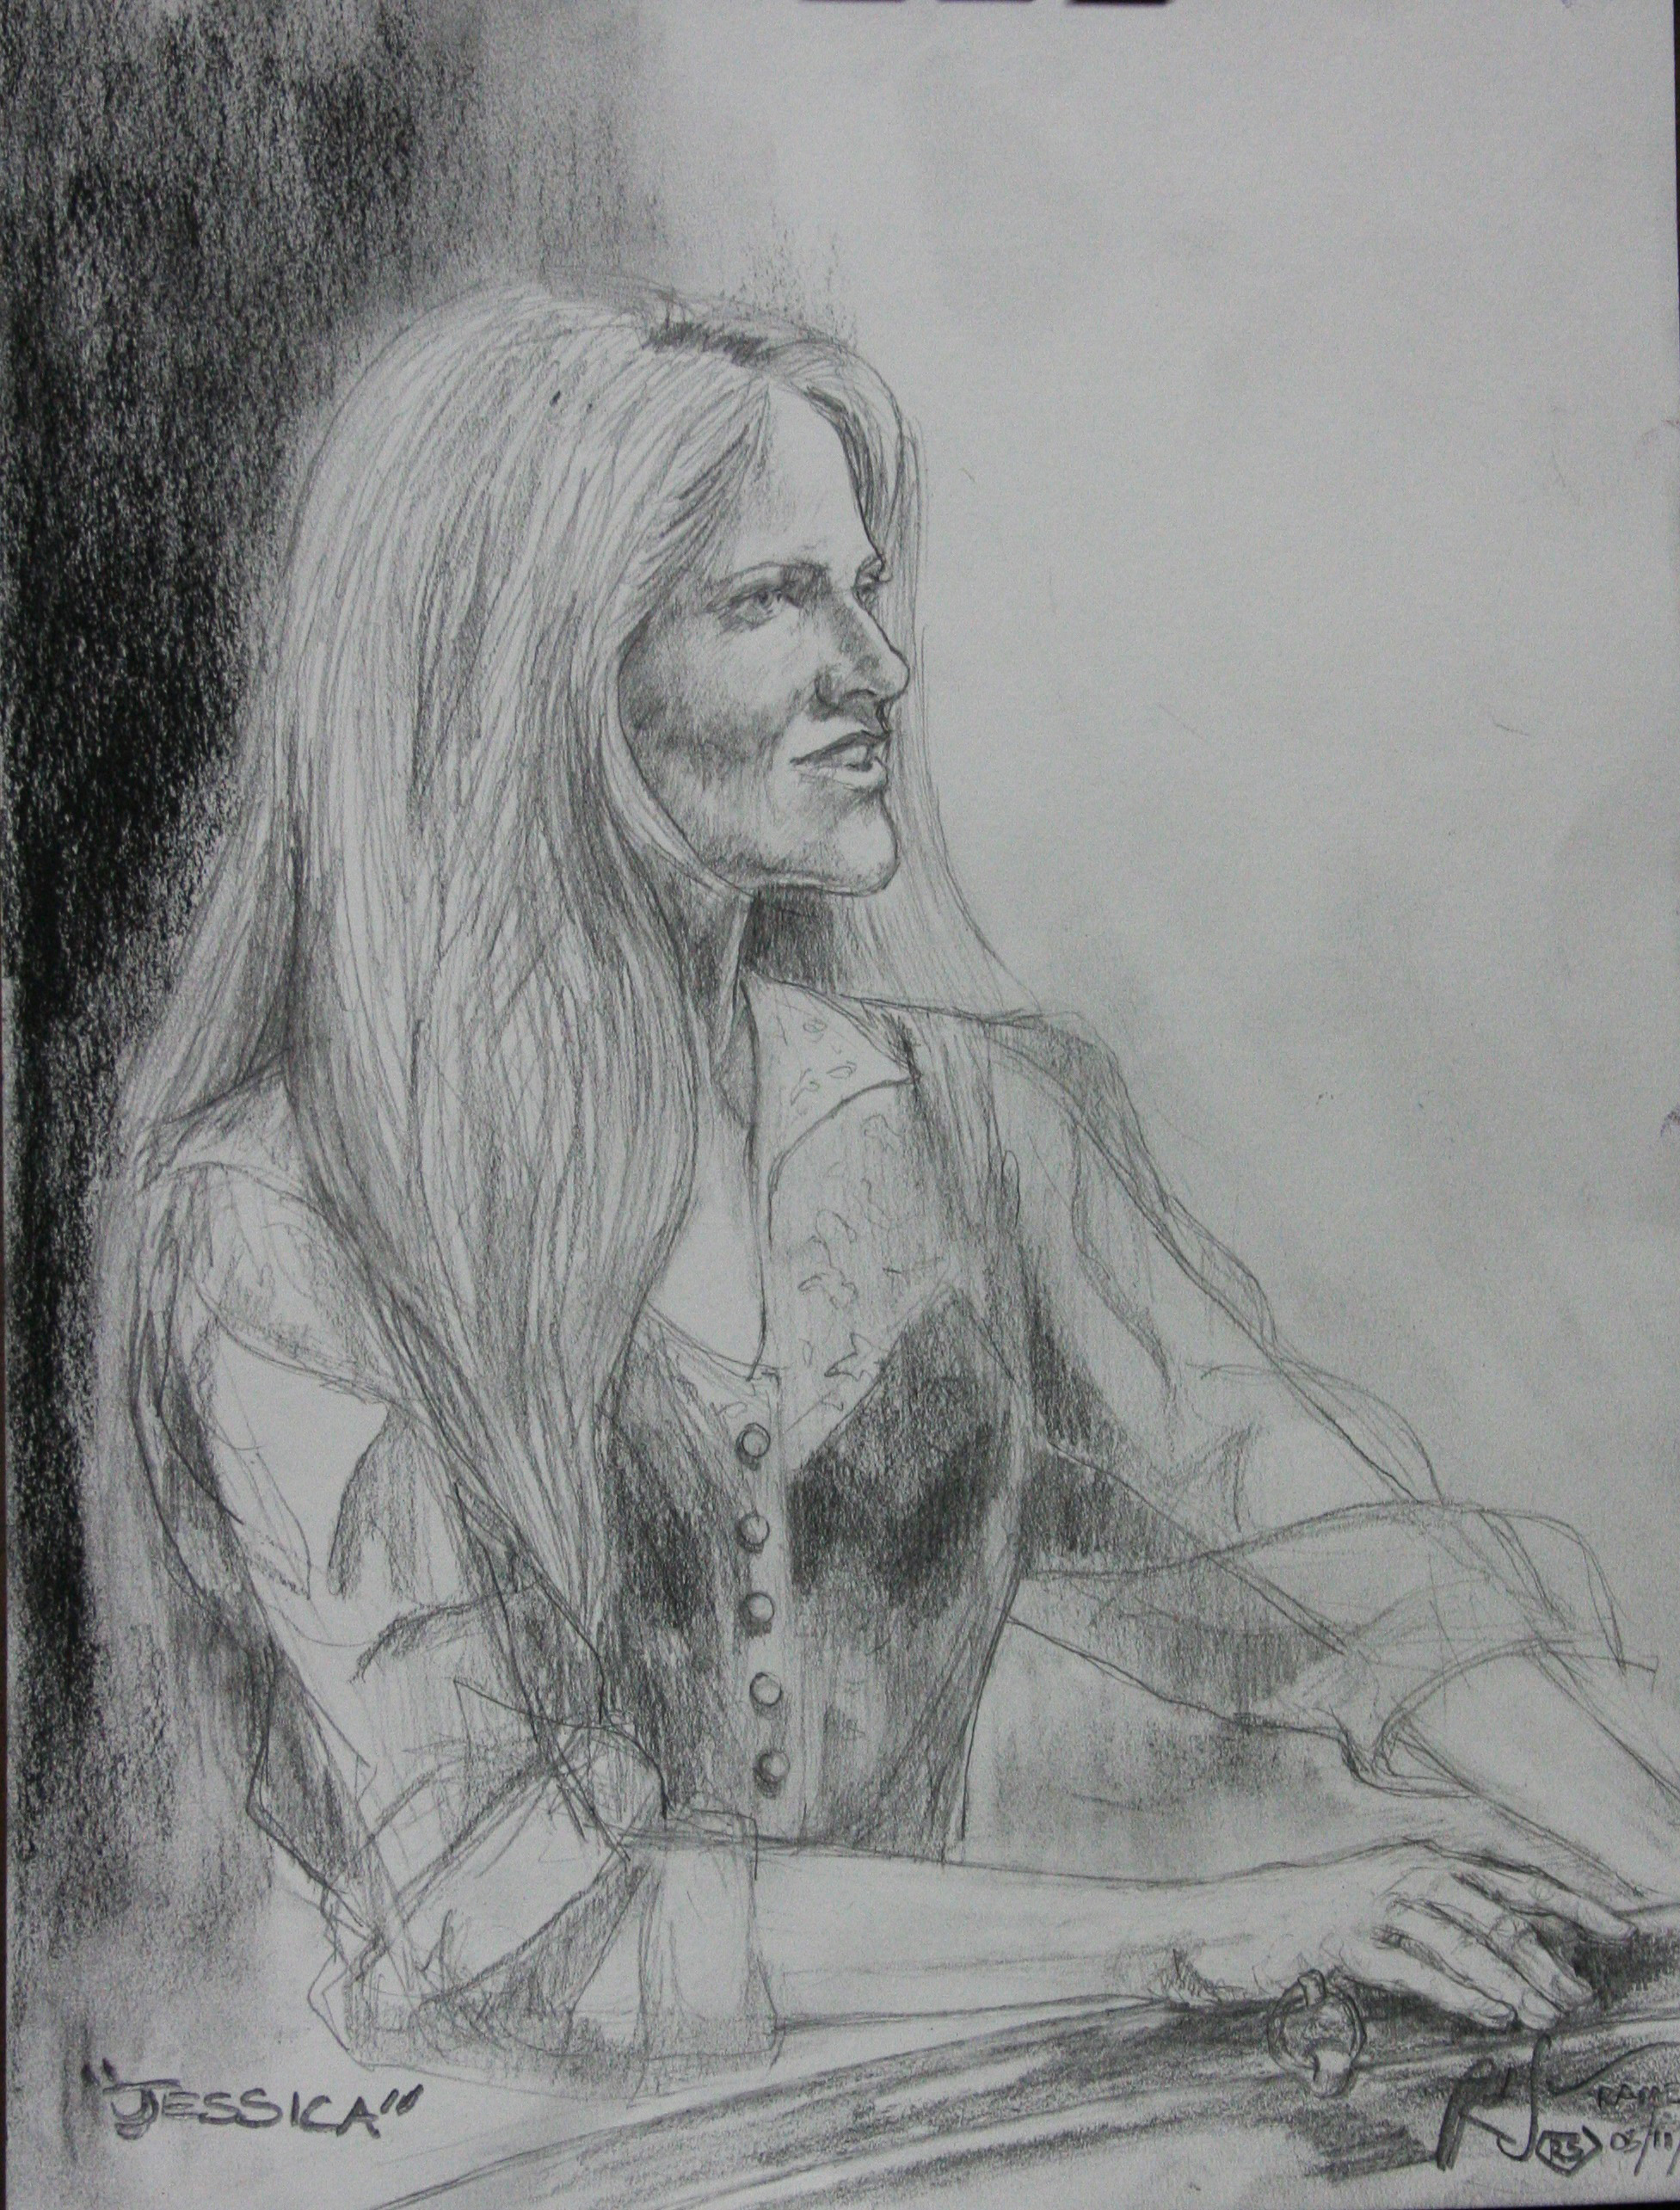 Ramesh Subramanium did this 2-hour drawing.